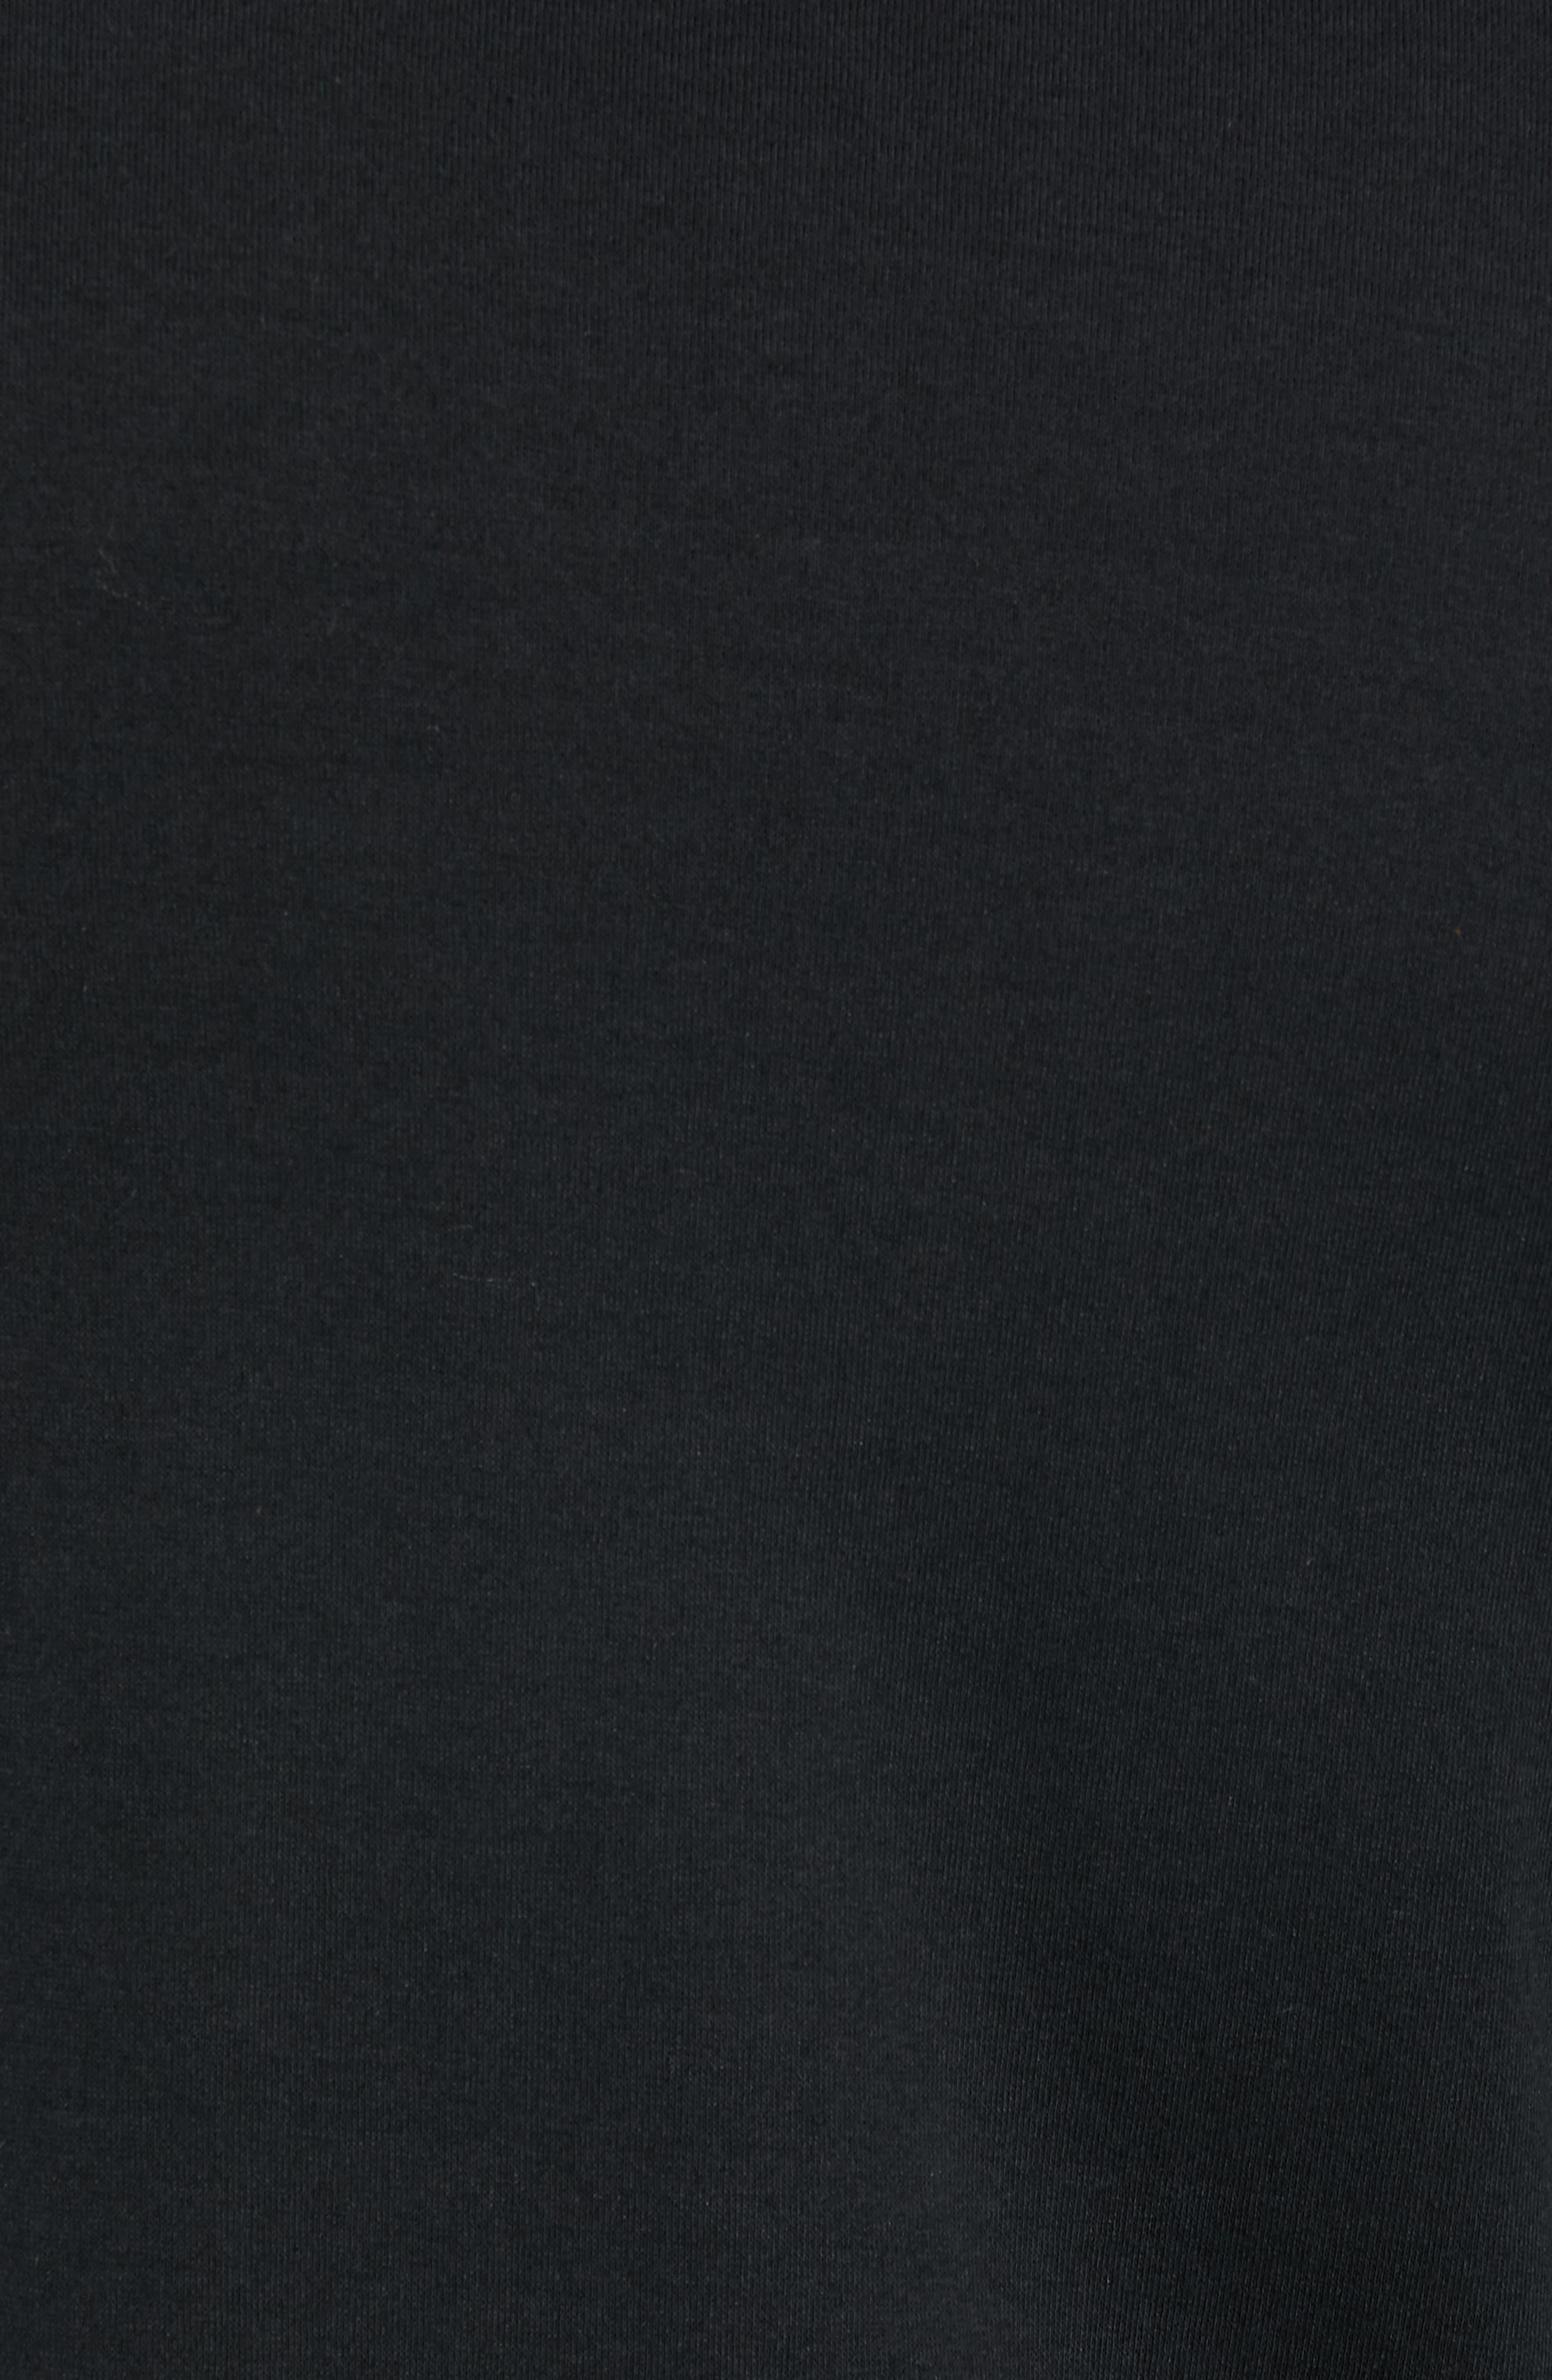 Trim Fit Long Sleeve Pocket T-Shirt,                             Alternate thumbnail 5, color,                             BLACK